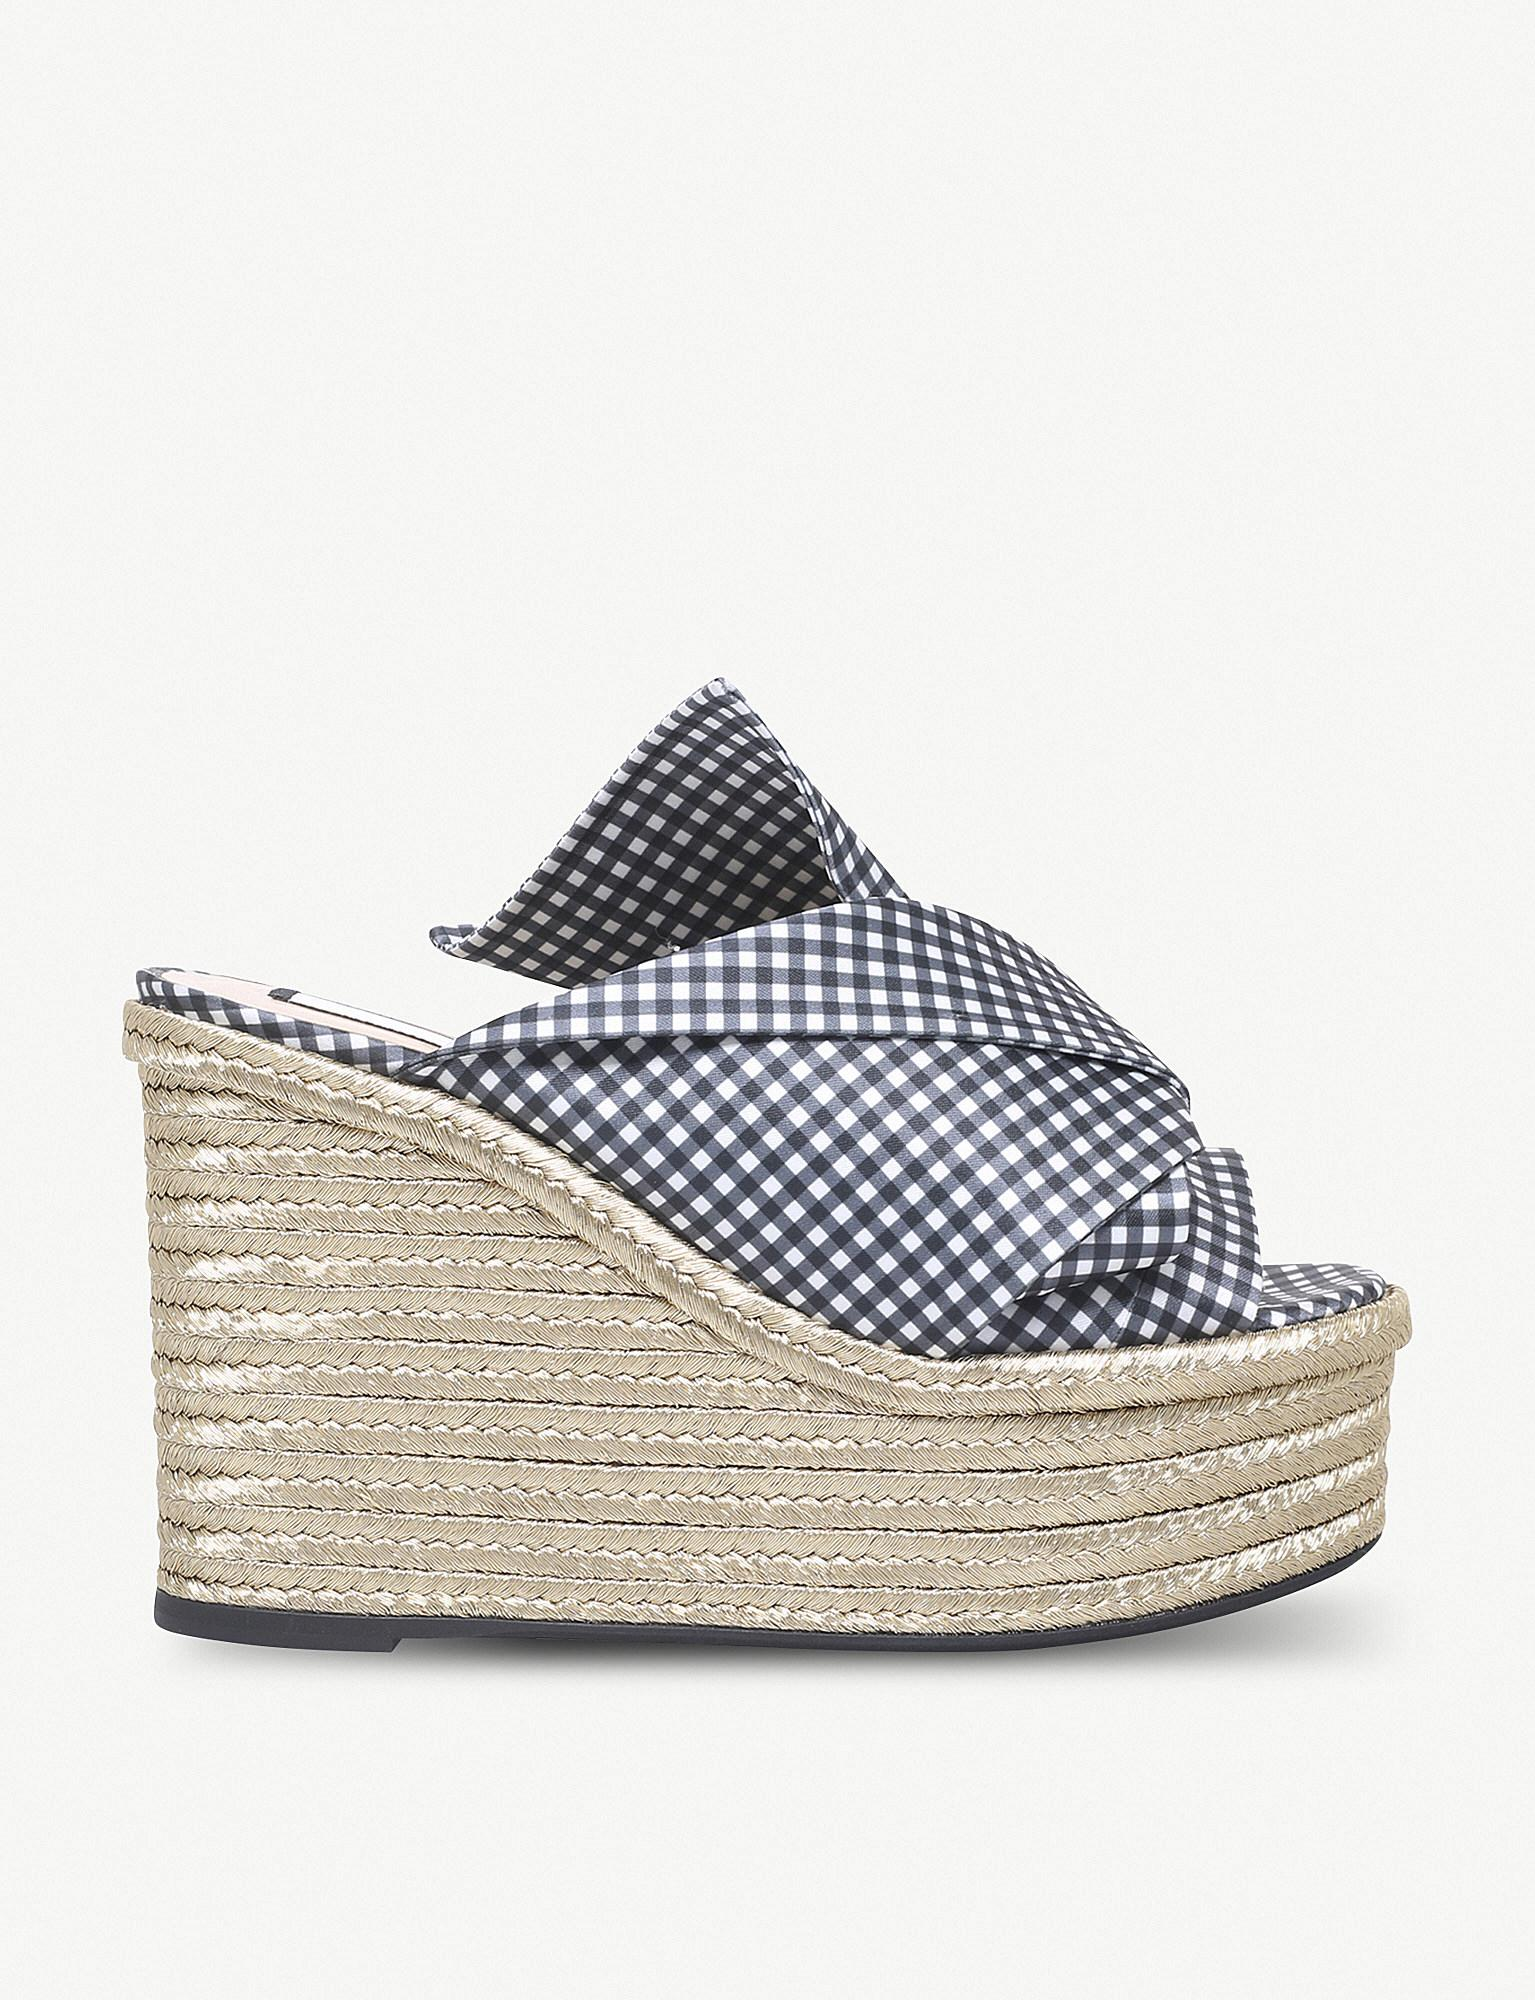 43a2dfd62b3 Lyst - N°21 Bow Espadrille Wedge Sandals